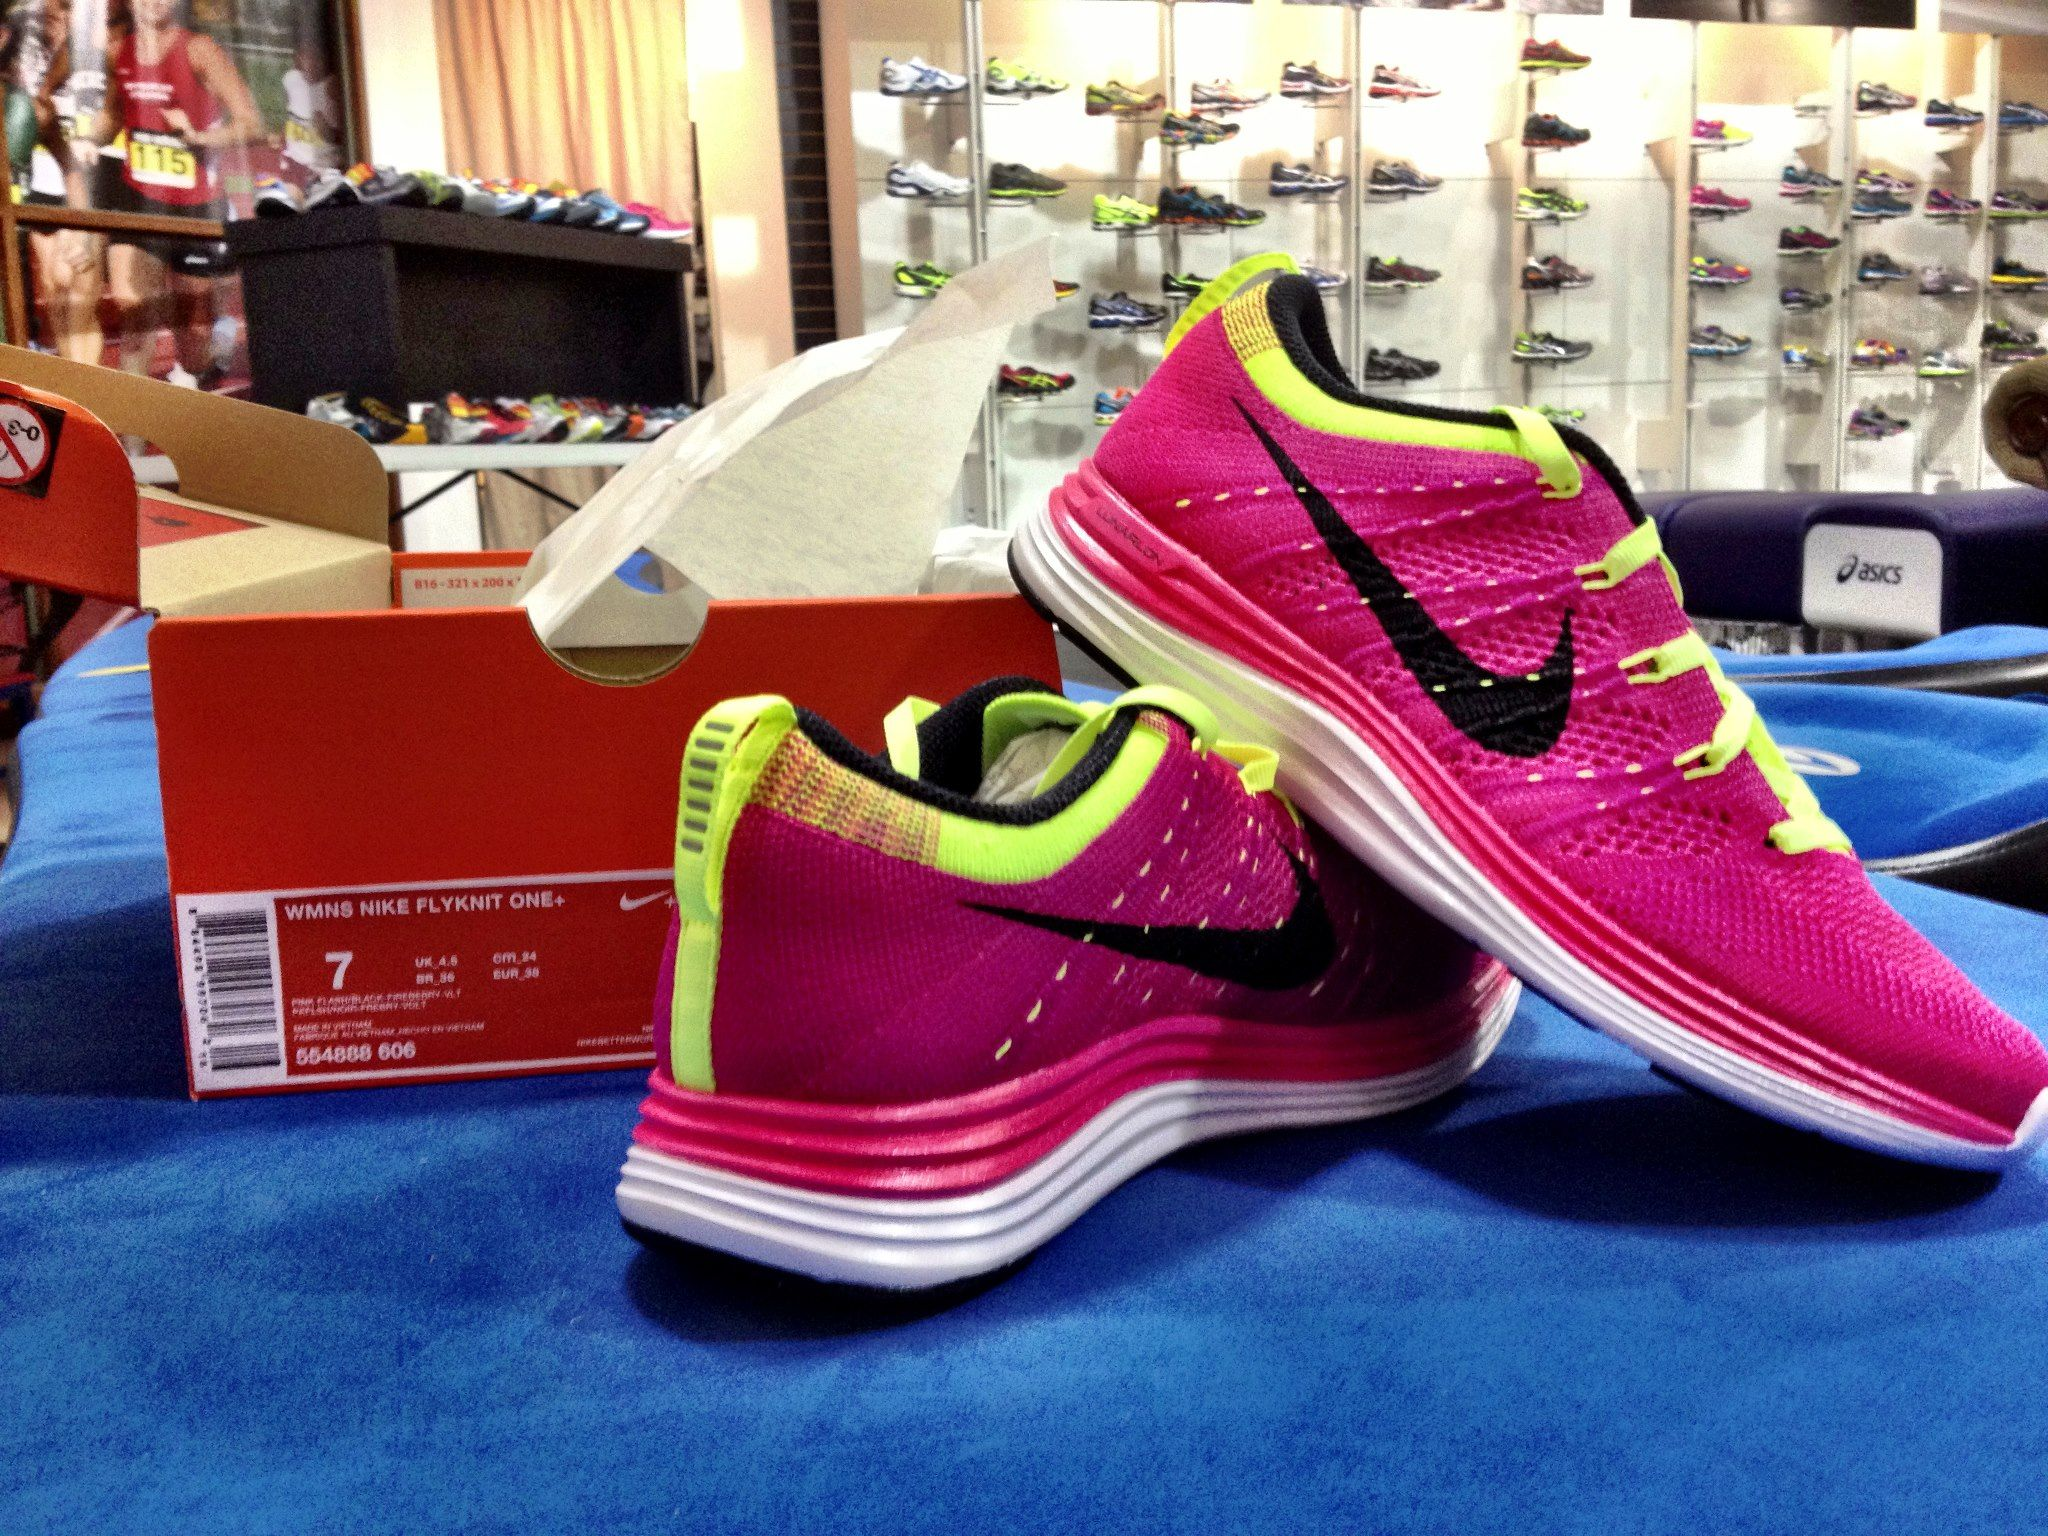 representante desagüe Vueltas y vueltas  Just released: the Nike FlyKnit Lunar 1+ (shown in Women's Pink Flash with  Volt) available at Luke's Locker! #FindTheOne #Flyknit | Cosas para  comprar, Compras